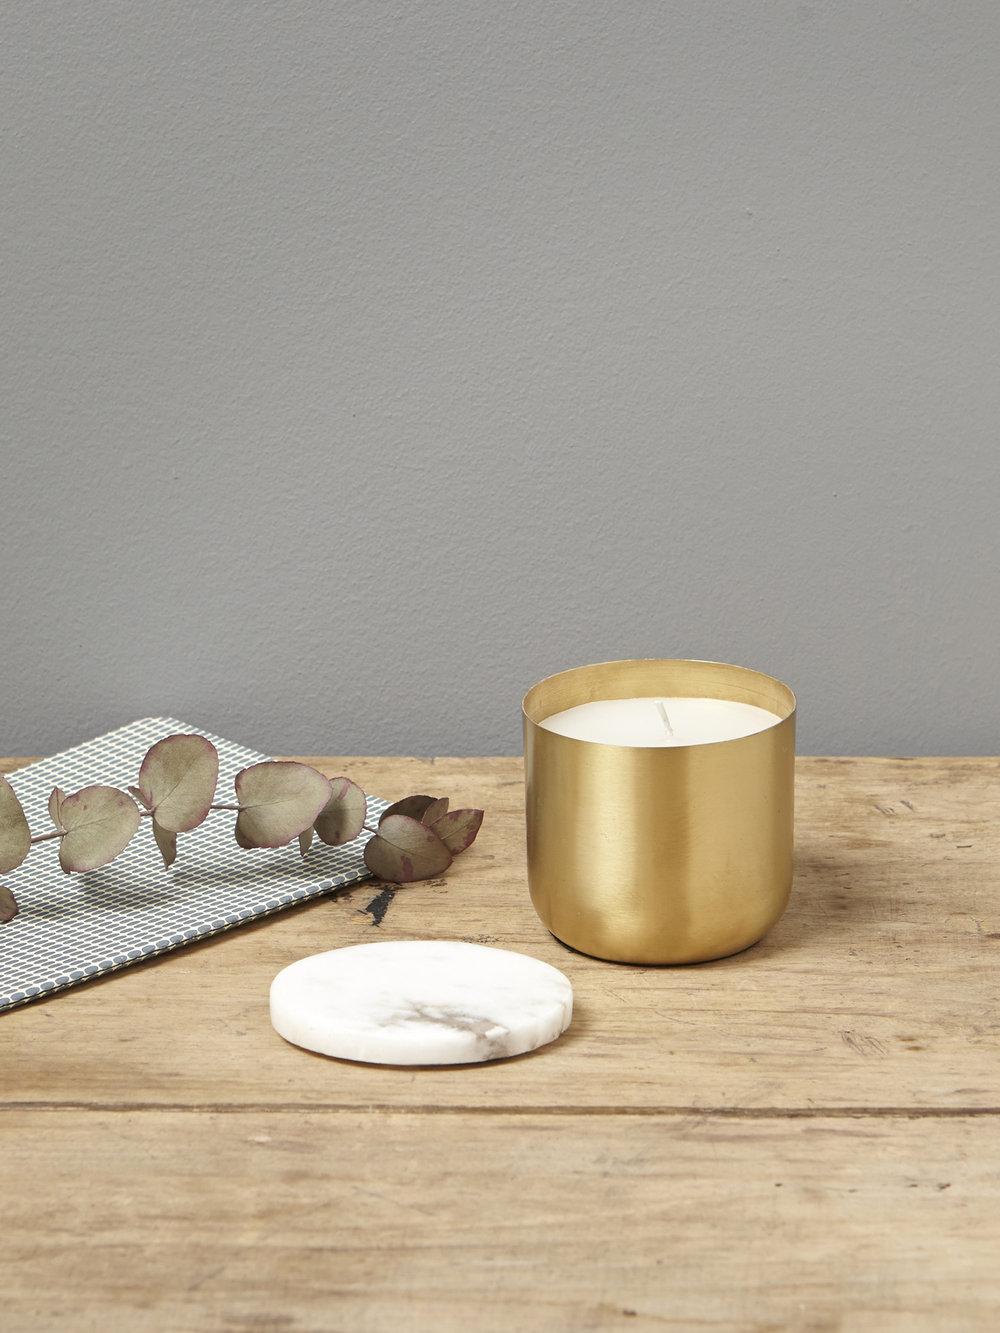 Bougie doré marbre 14,90€